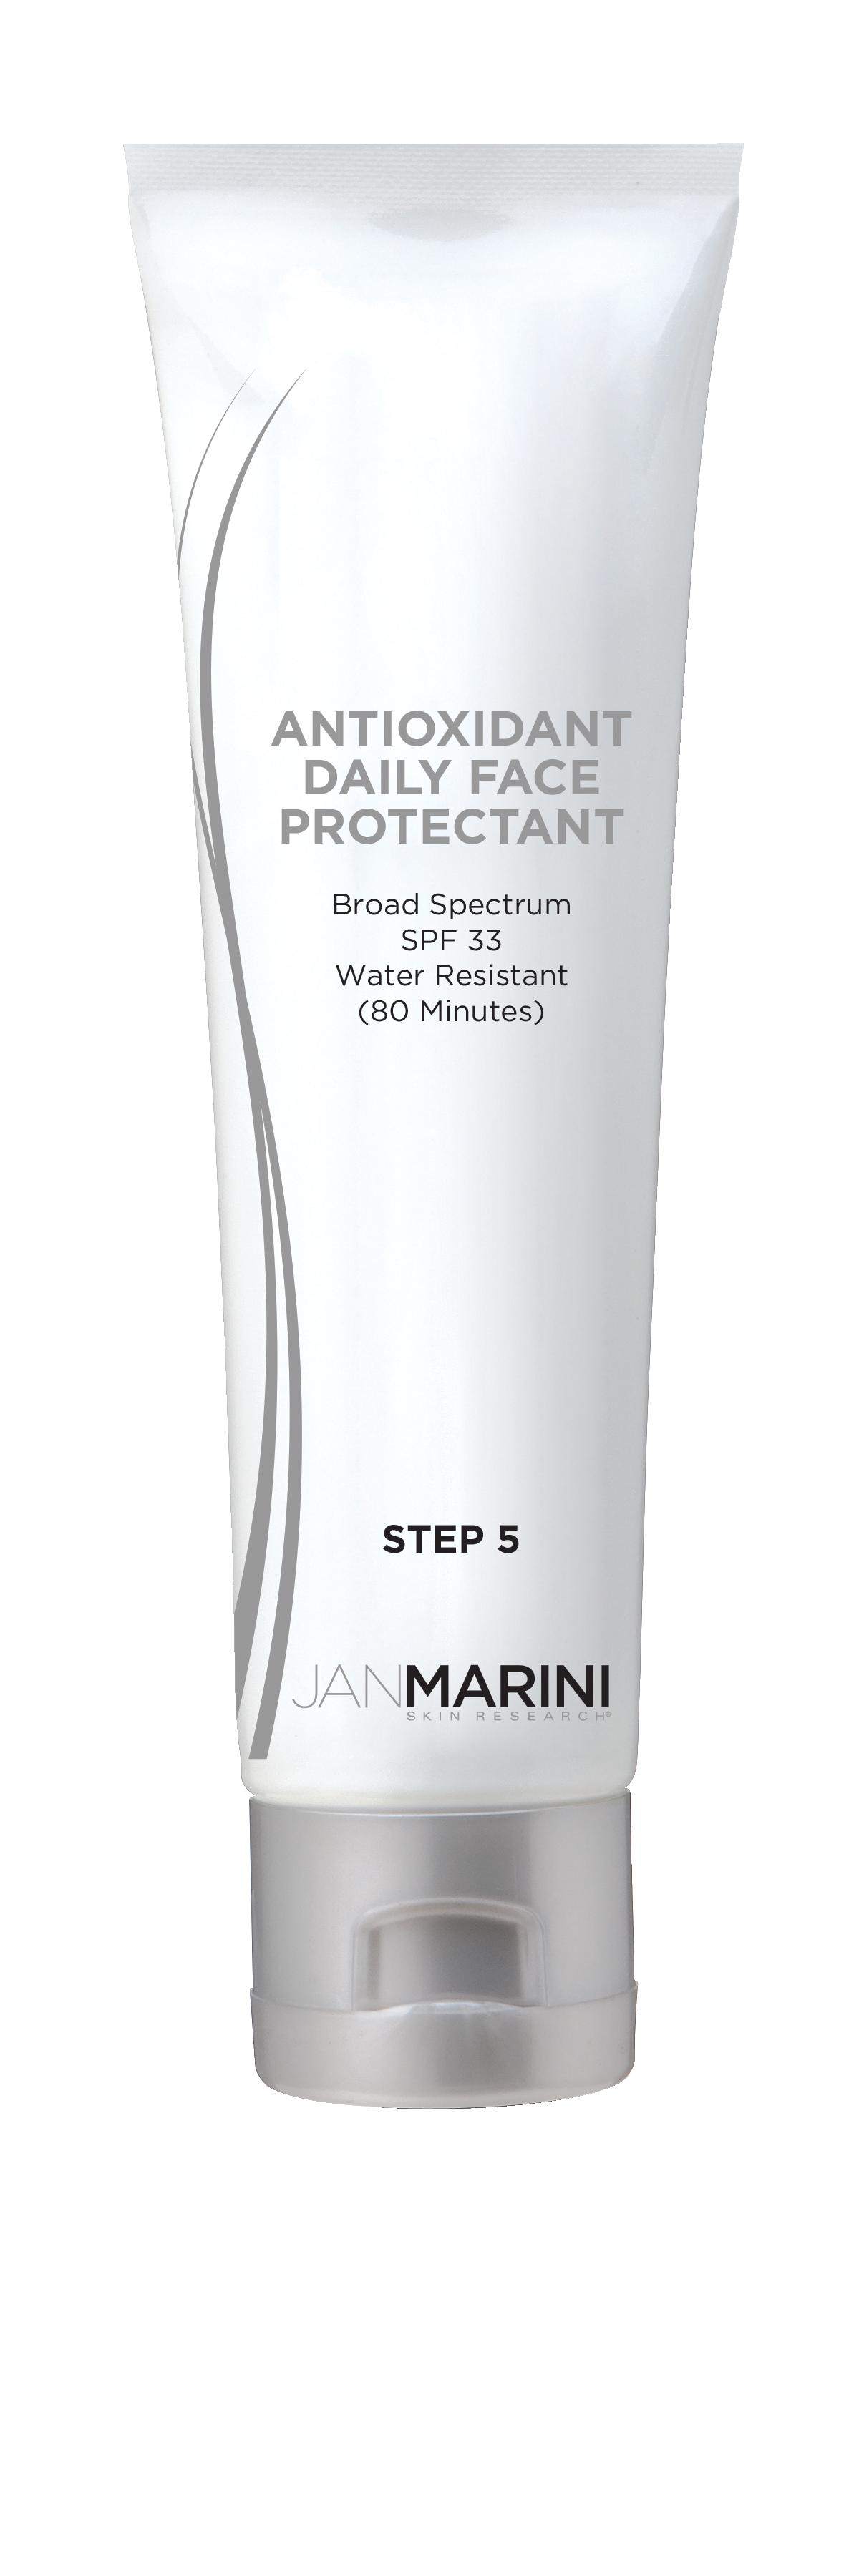 JAN MARINI Antioxidant Daily Face Protectant SPF 33, AVAILABLE AT JANMARINI